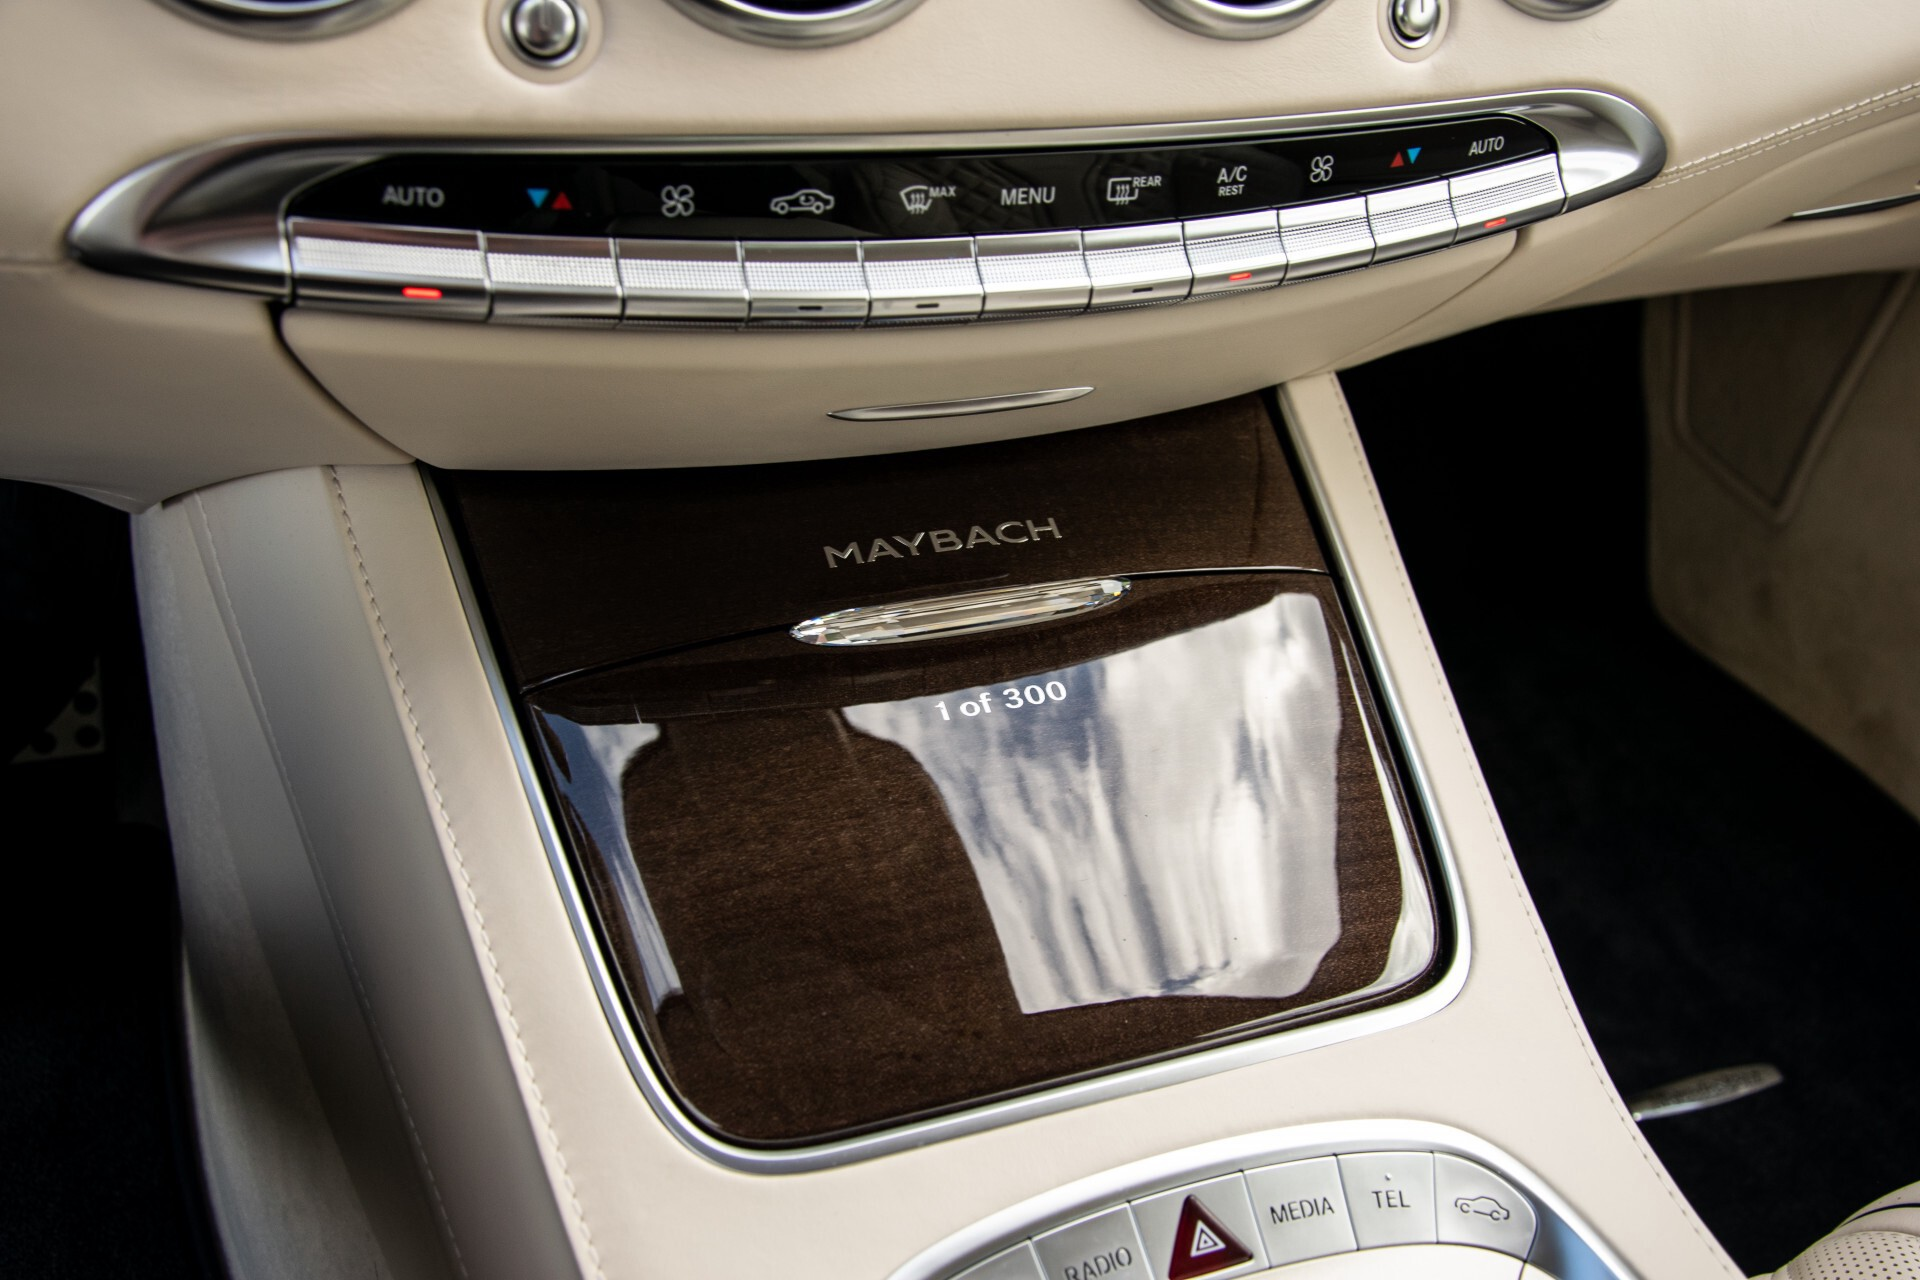 Mercedes-Benz S-Klasse Cabrio 650 Maybach 1 of 300 1ste eigenaar 642 km Aut7 Foto 46